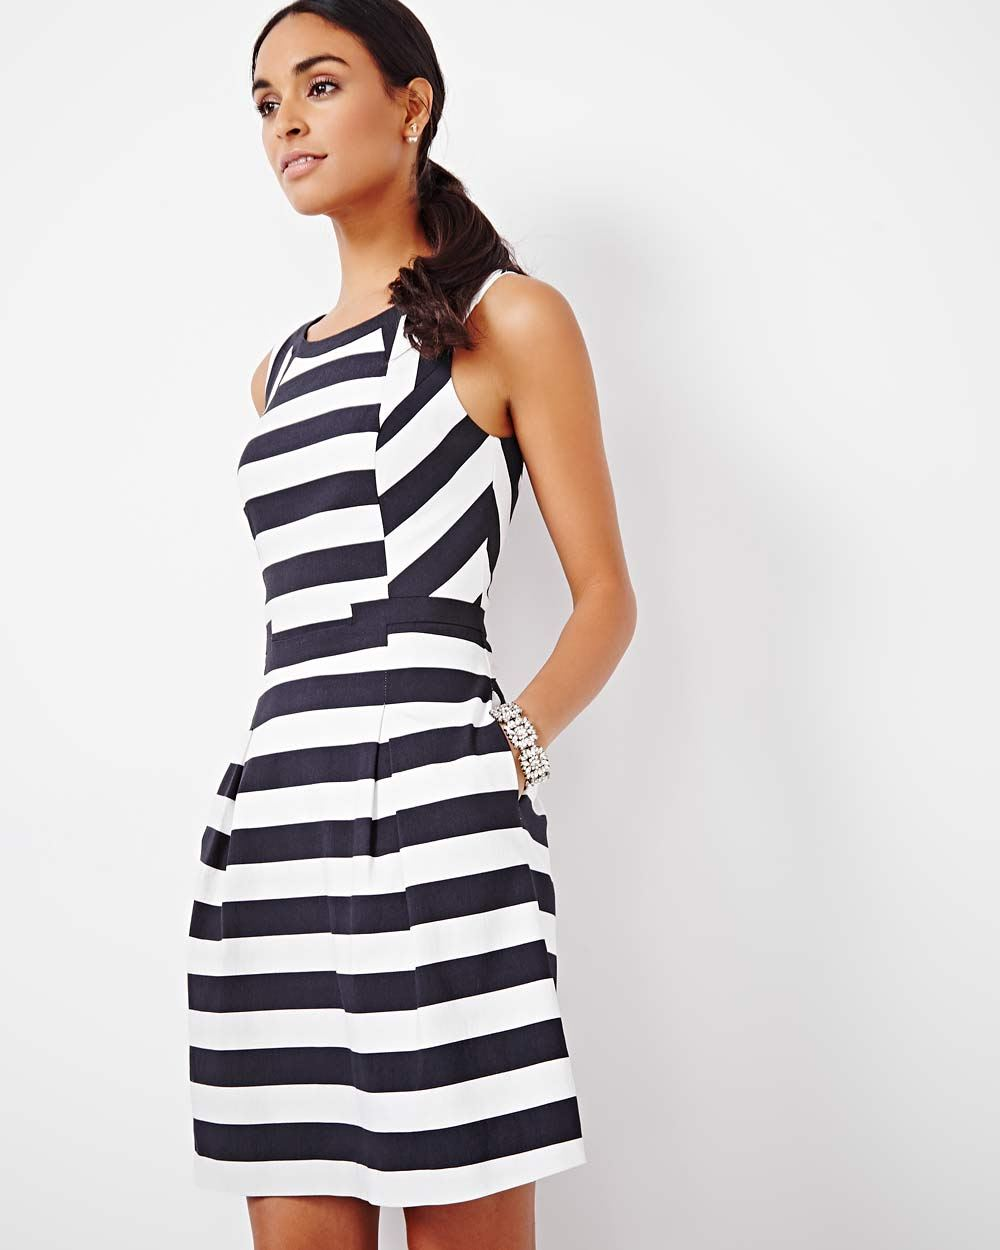 6258deb9cbb9 Striped Fit and Flare Dress | RW&CO.